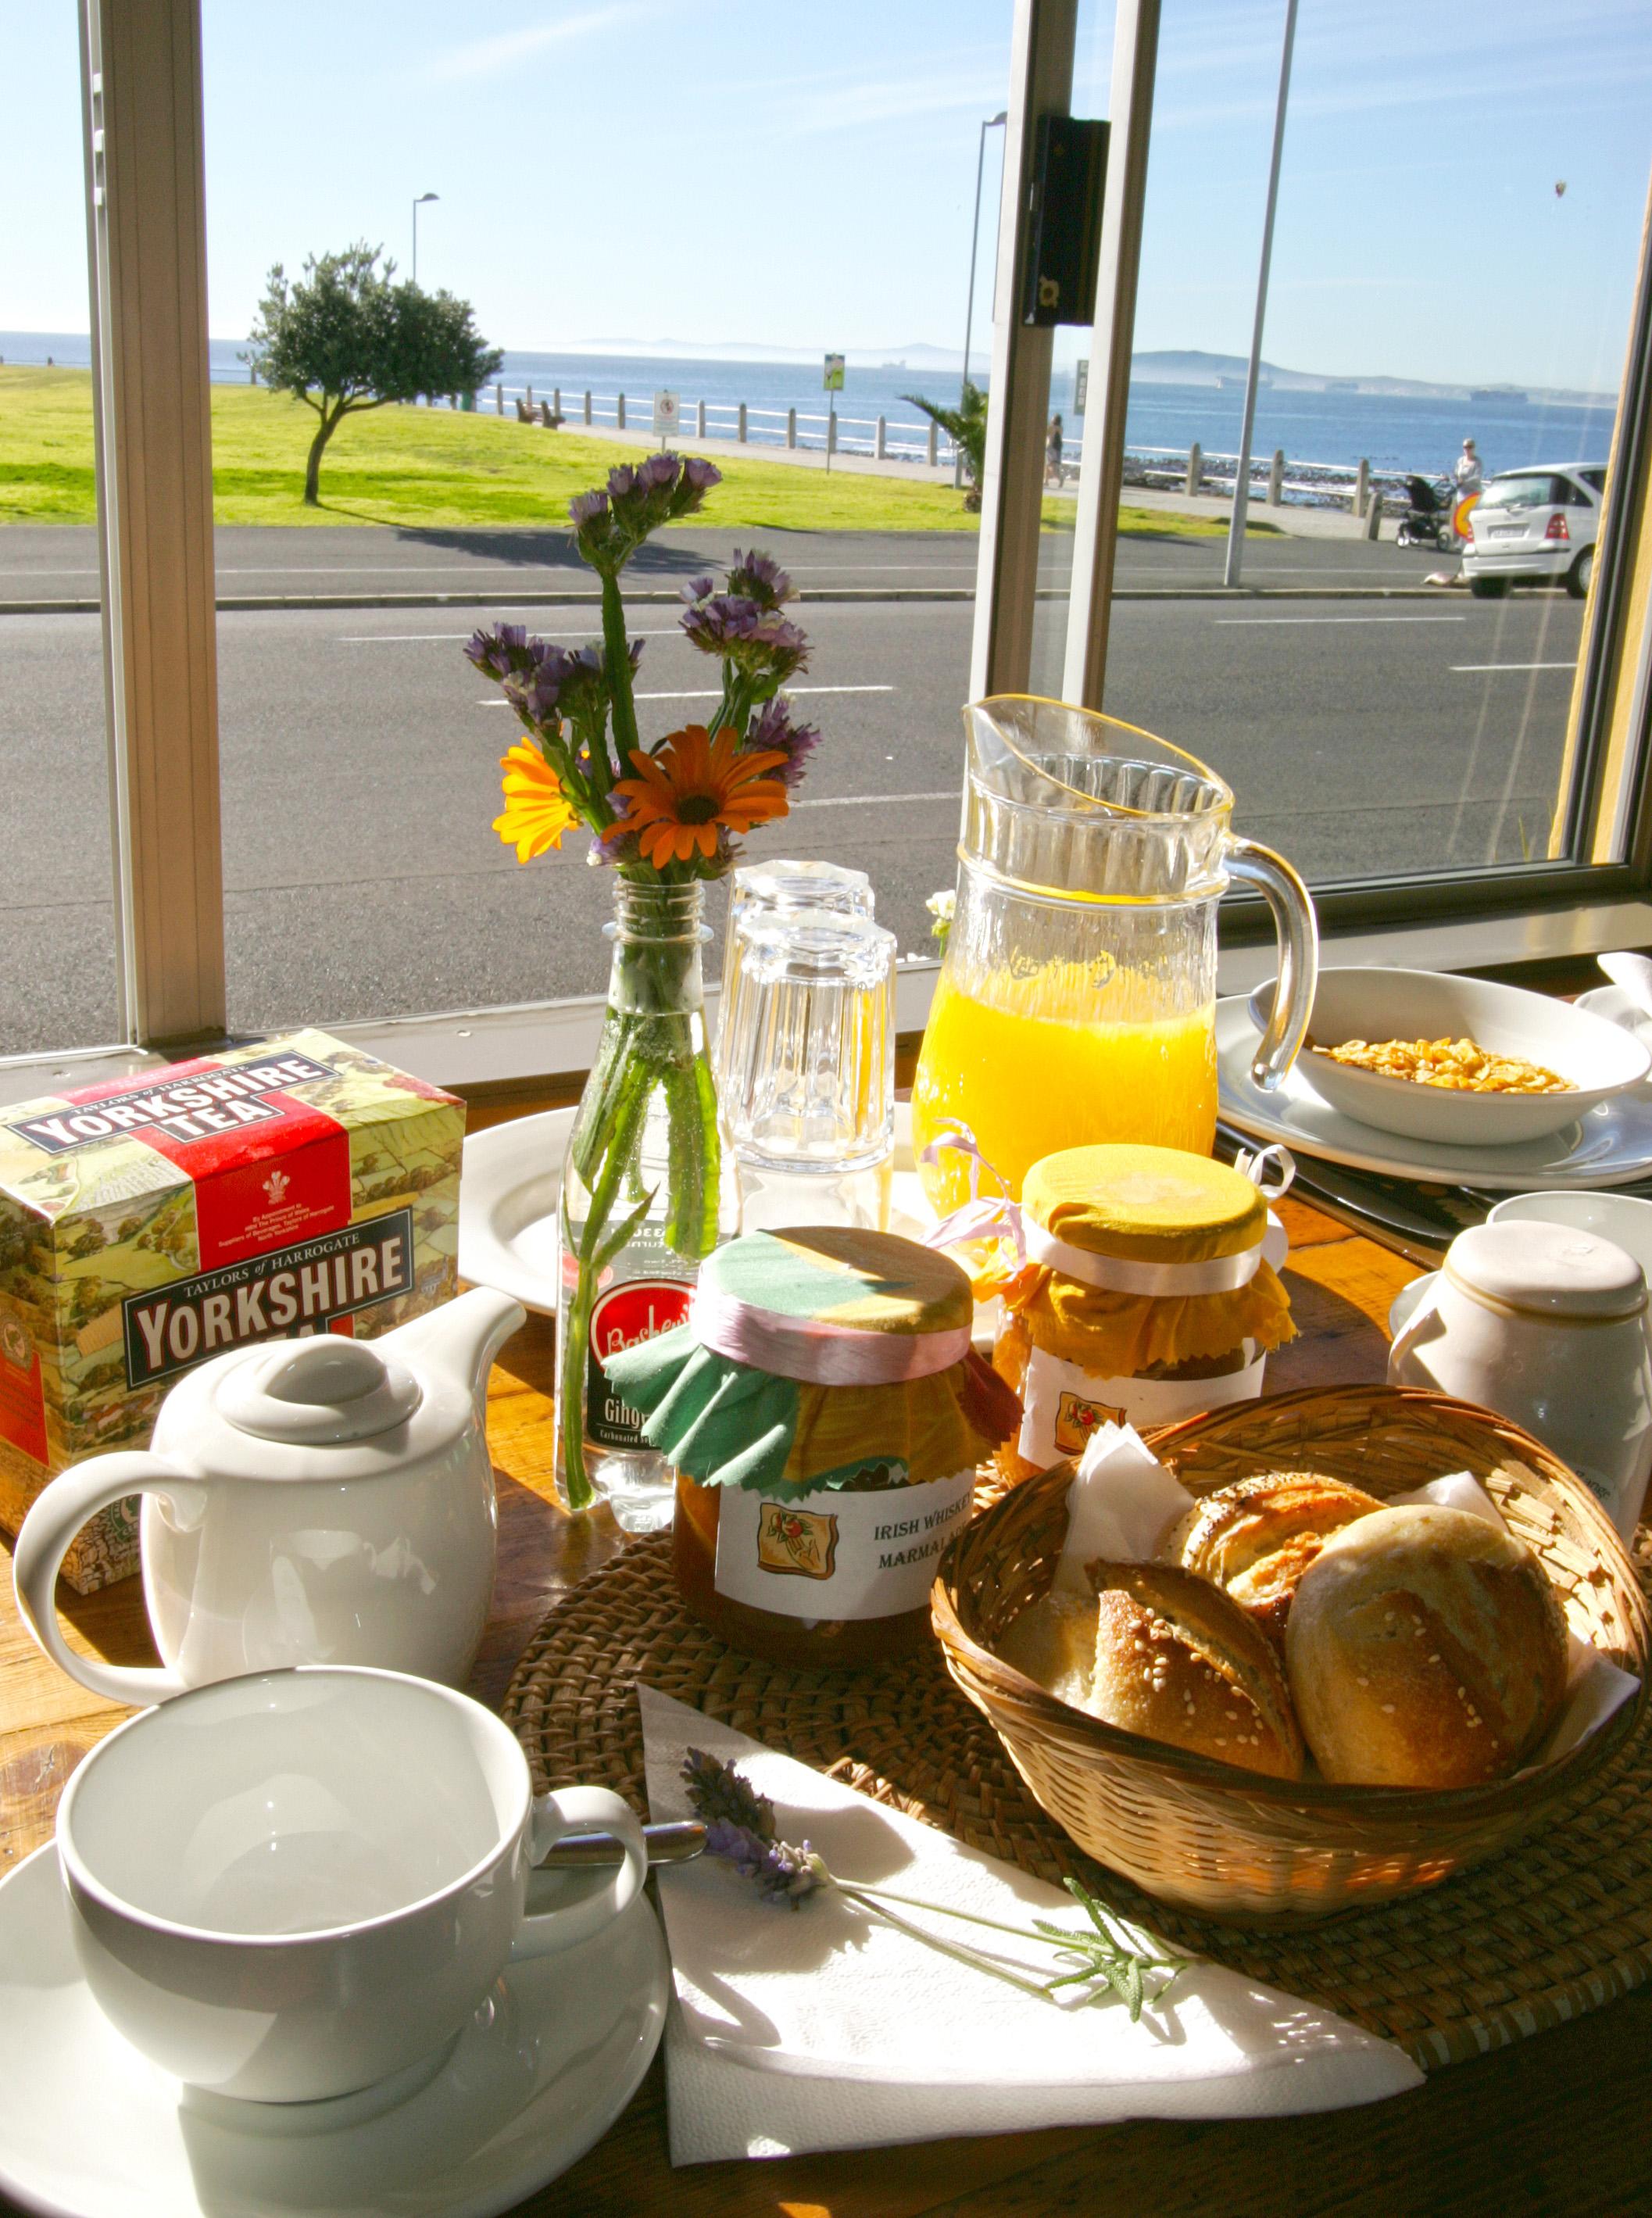 Breakfast at the Dolphin Inn 2